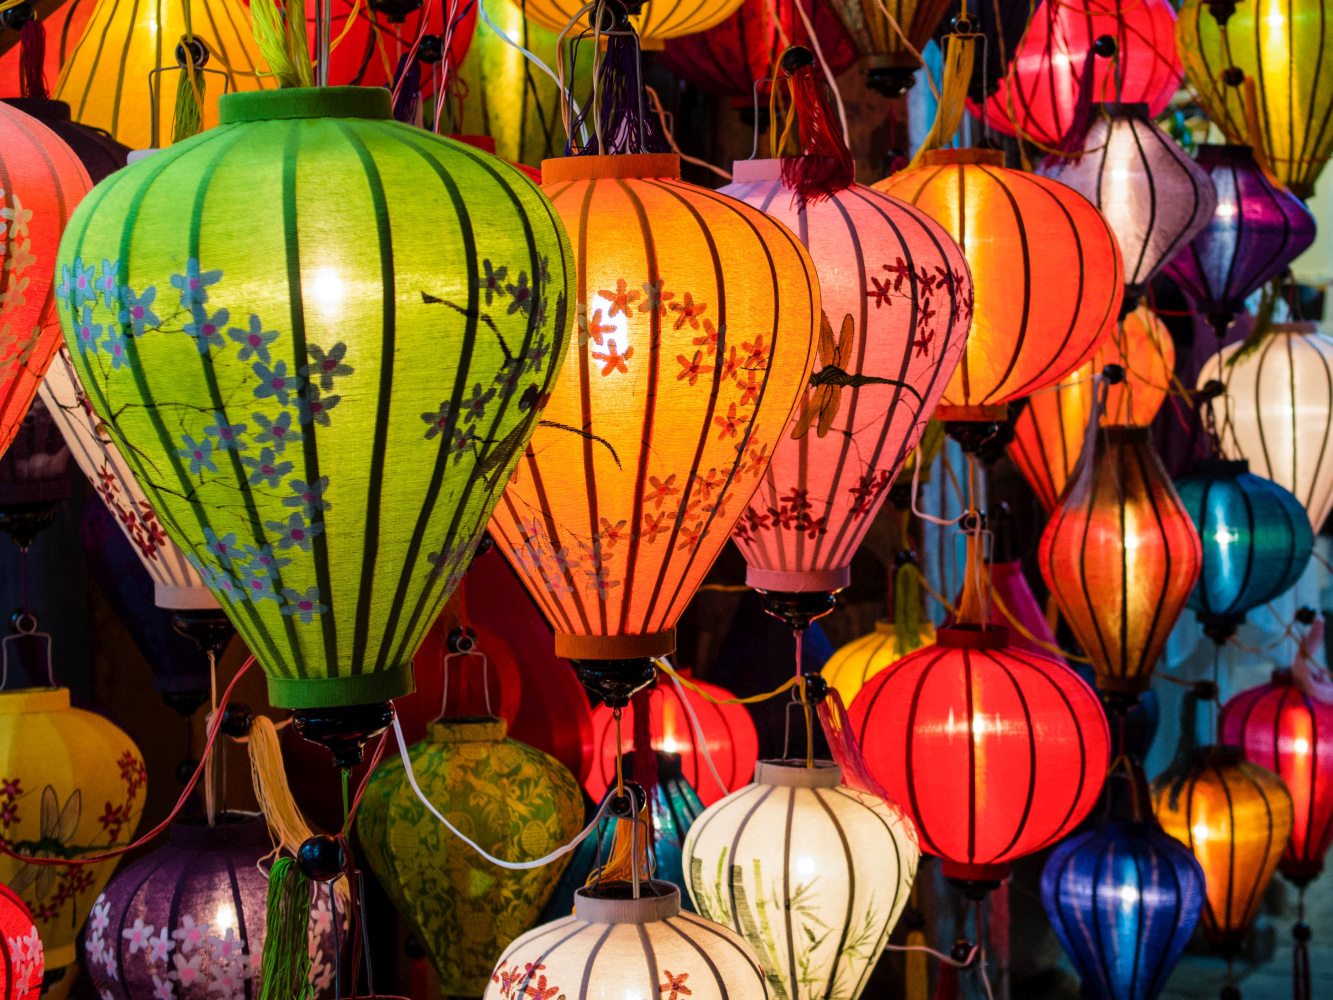 Vietnam Hoi An traditionelle Lampenferigung 123RF